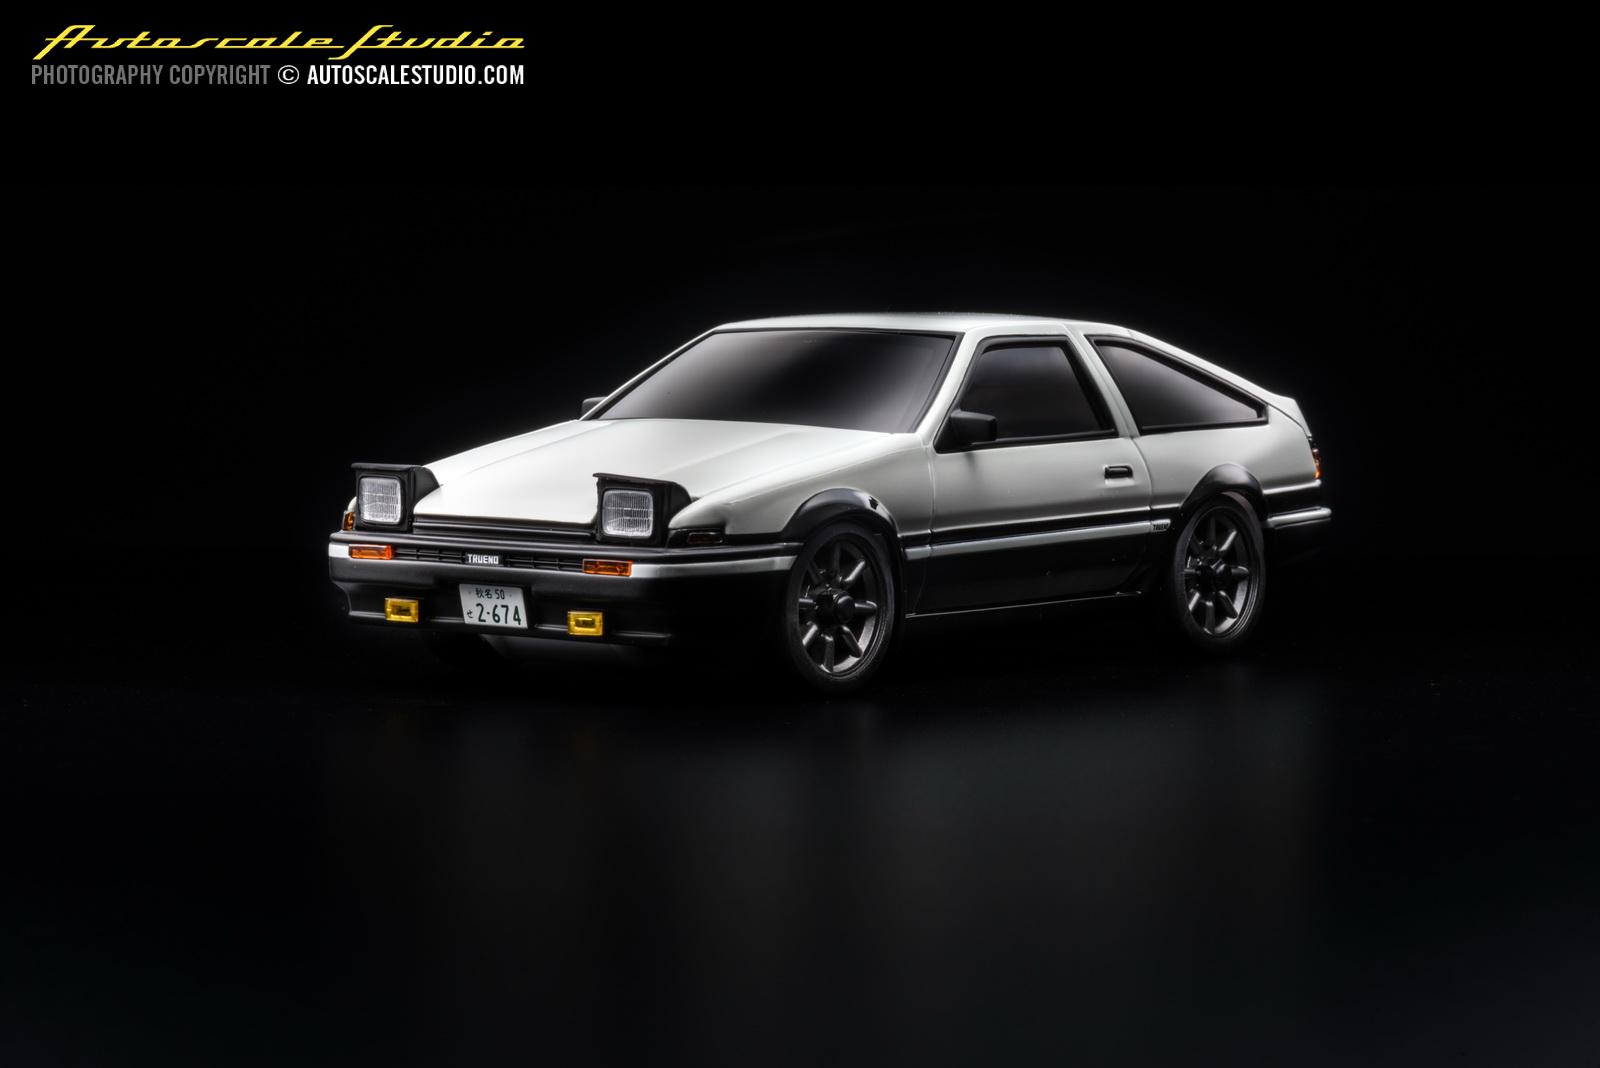 Toyota Sprinter Trueno IX 1995 - 2000 Coupe #6